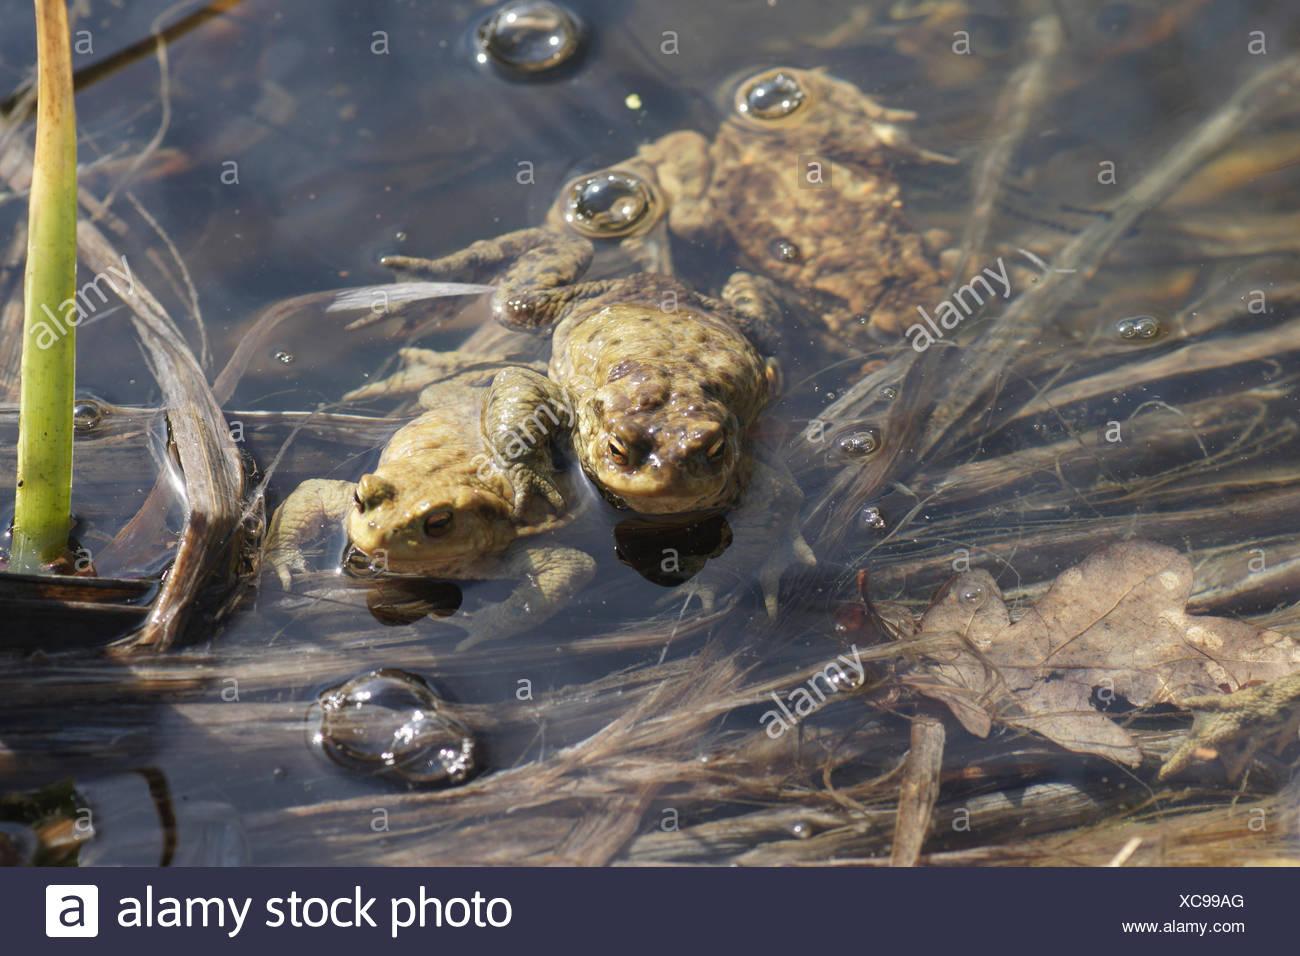 Bufo bufo, Toad, mating - Stock Image